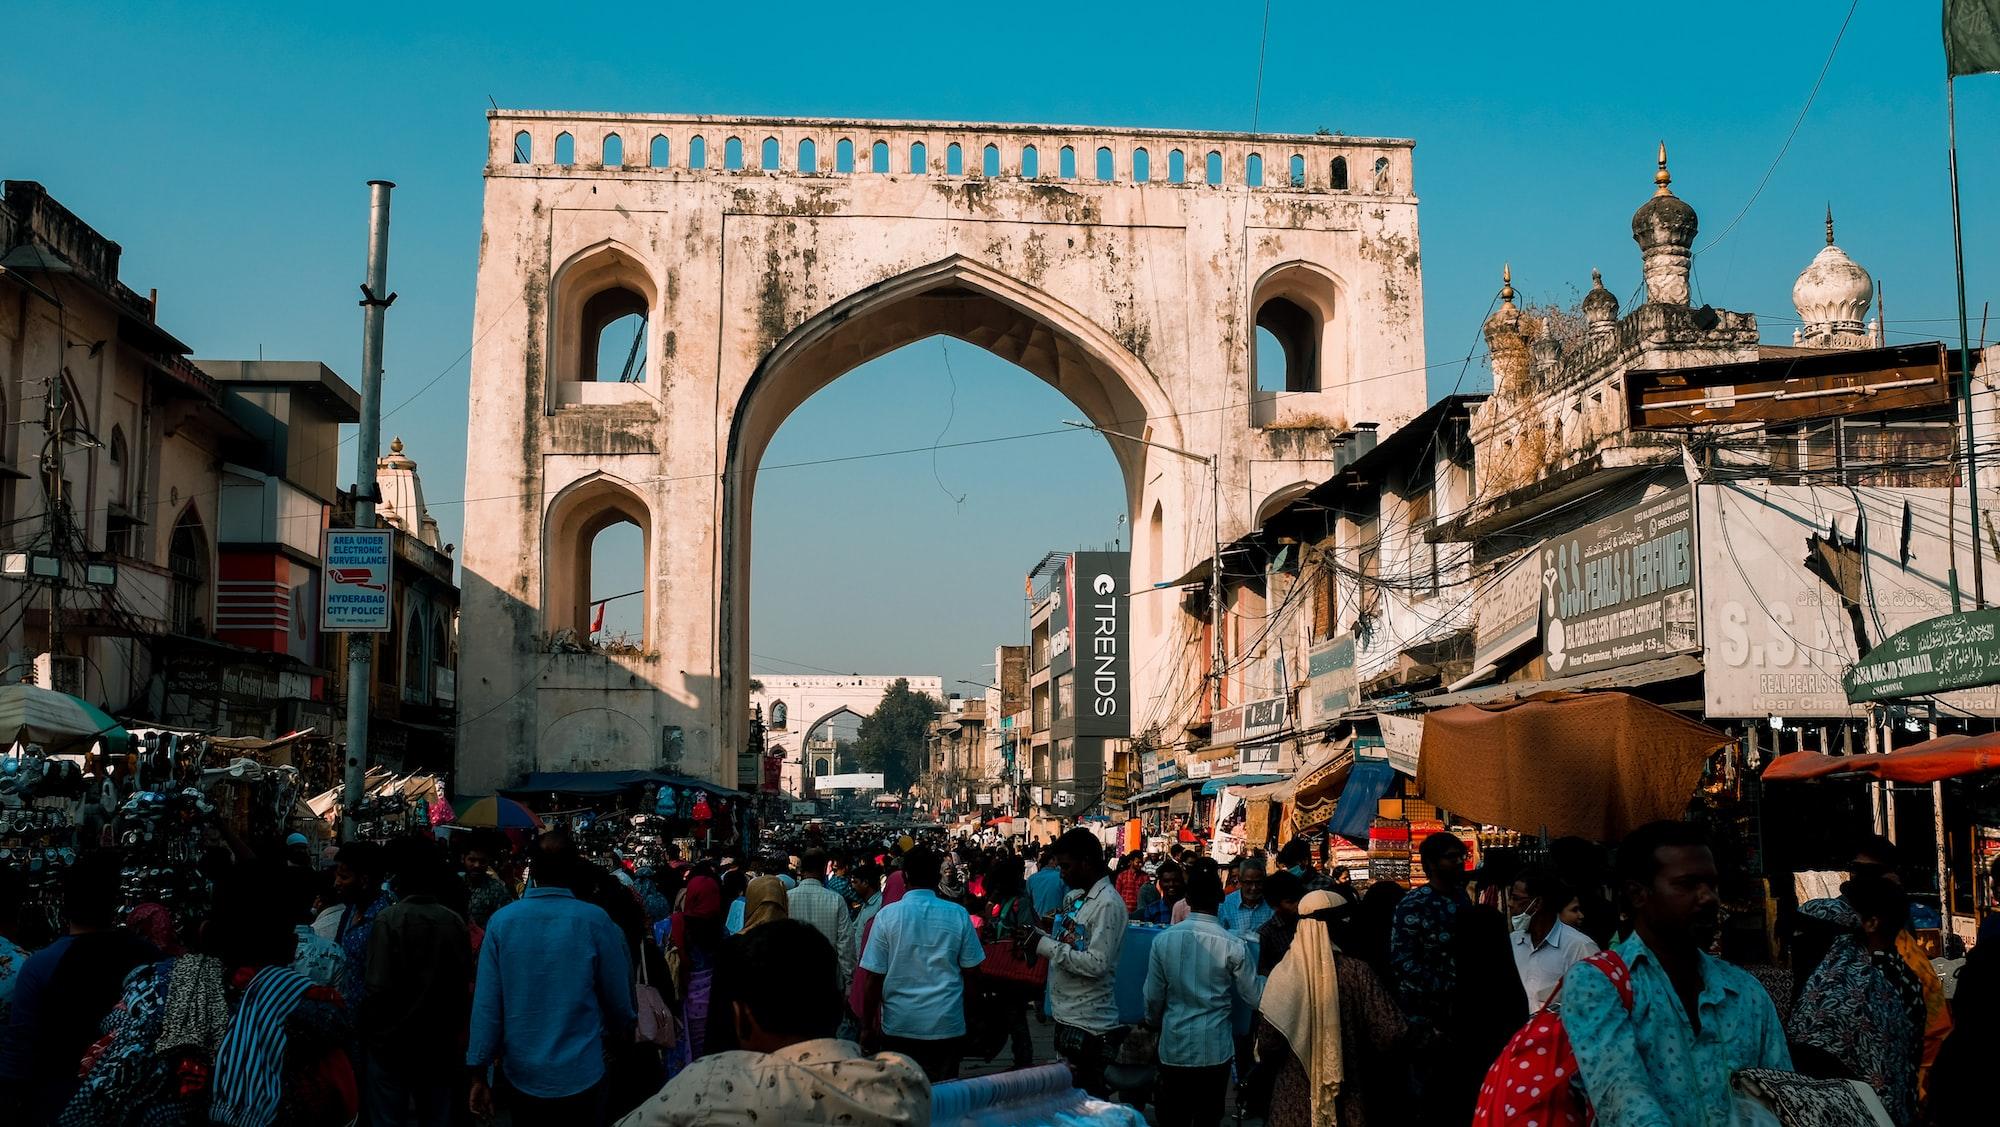 Through the old Nizam City